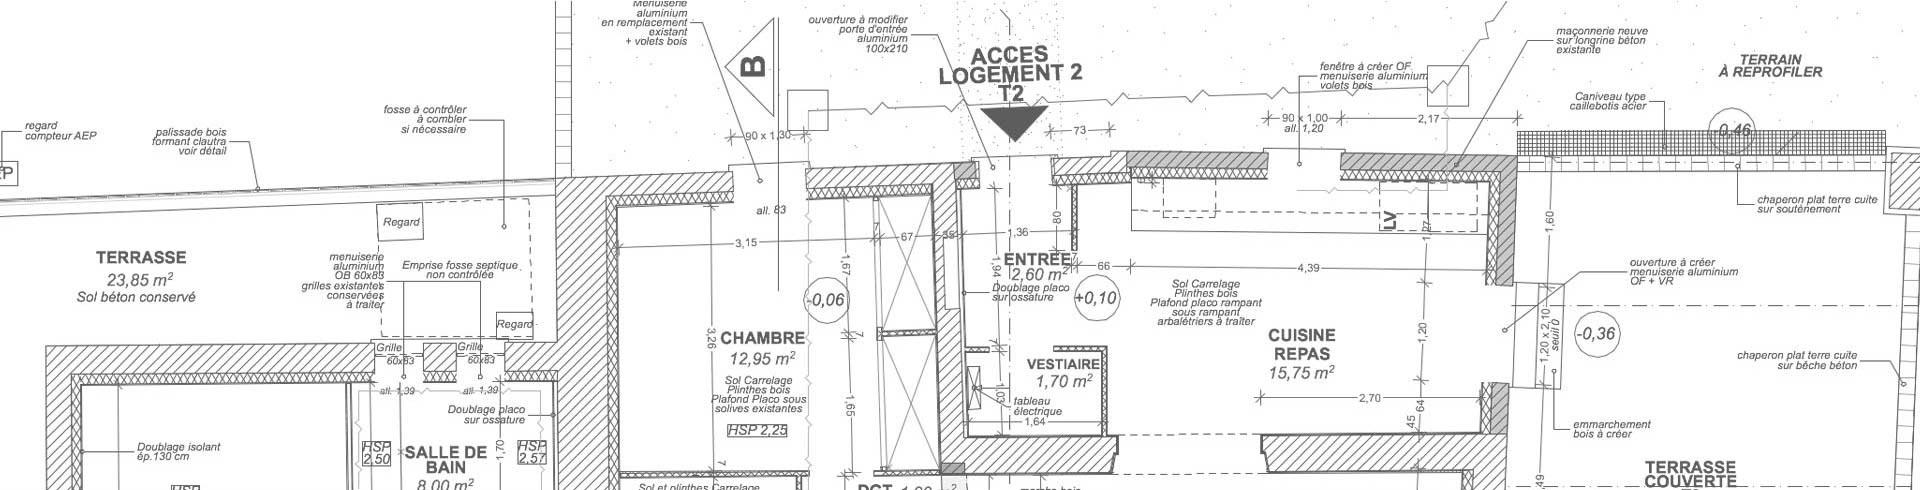 Marc vergely architecte dplg caussade tarn et garonne for Plan caussade